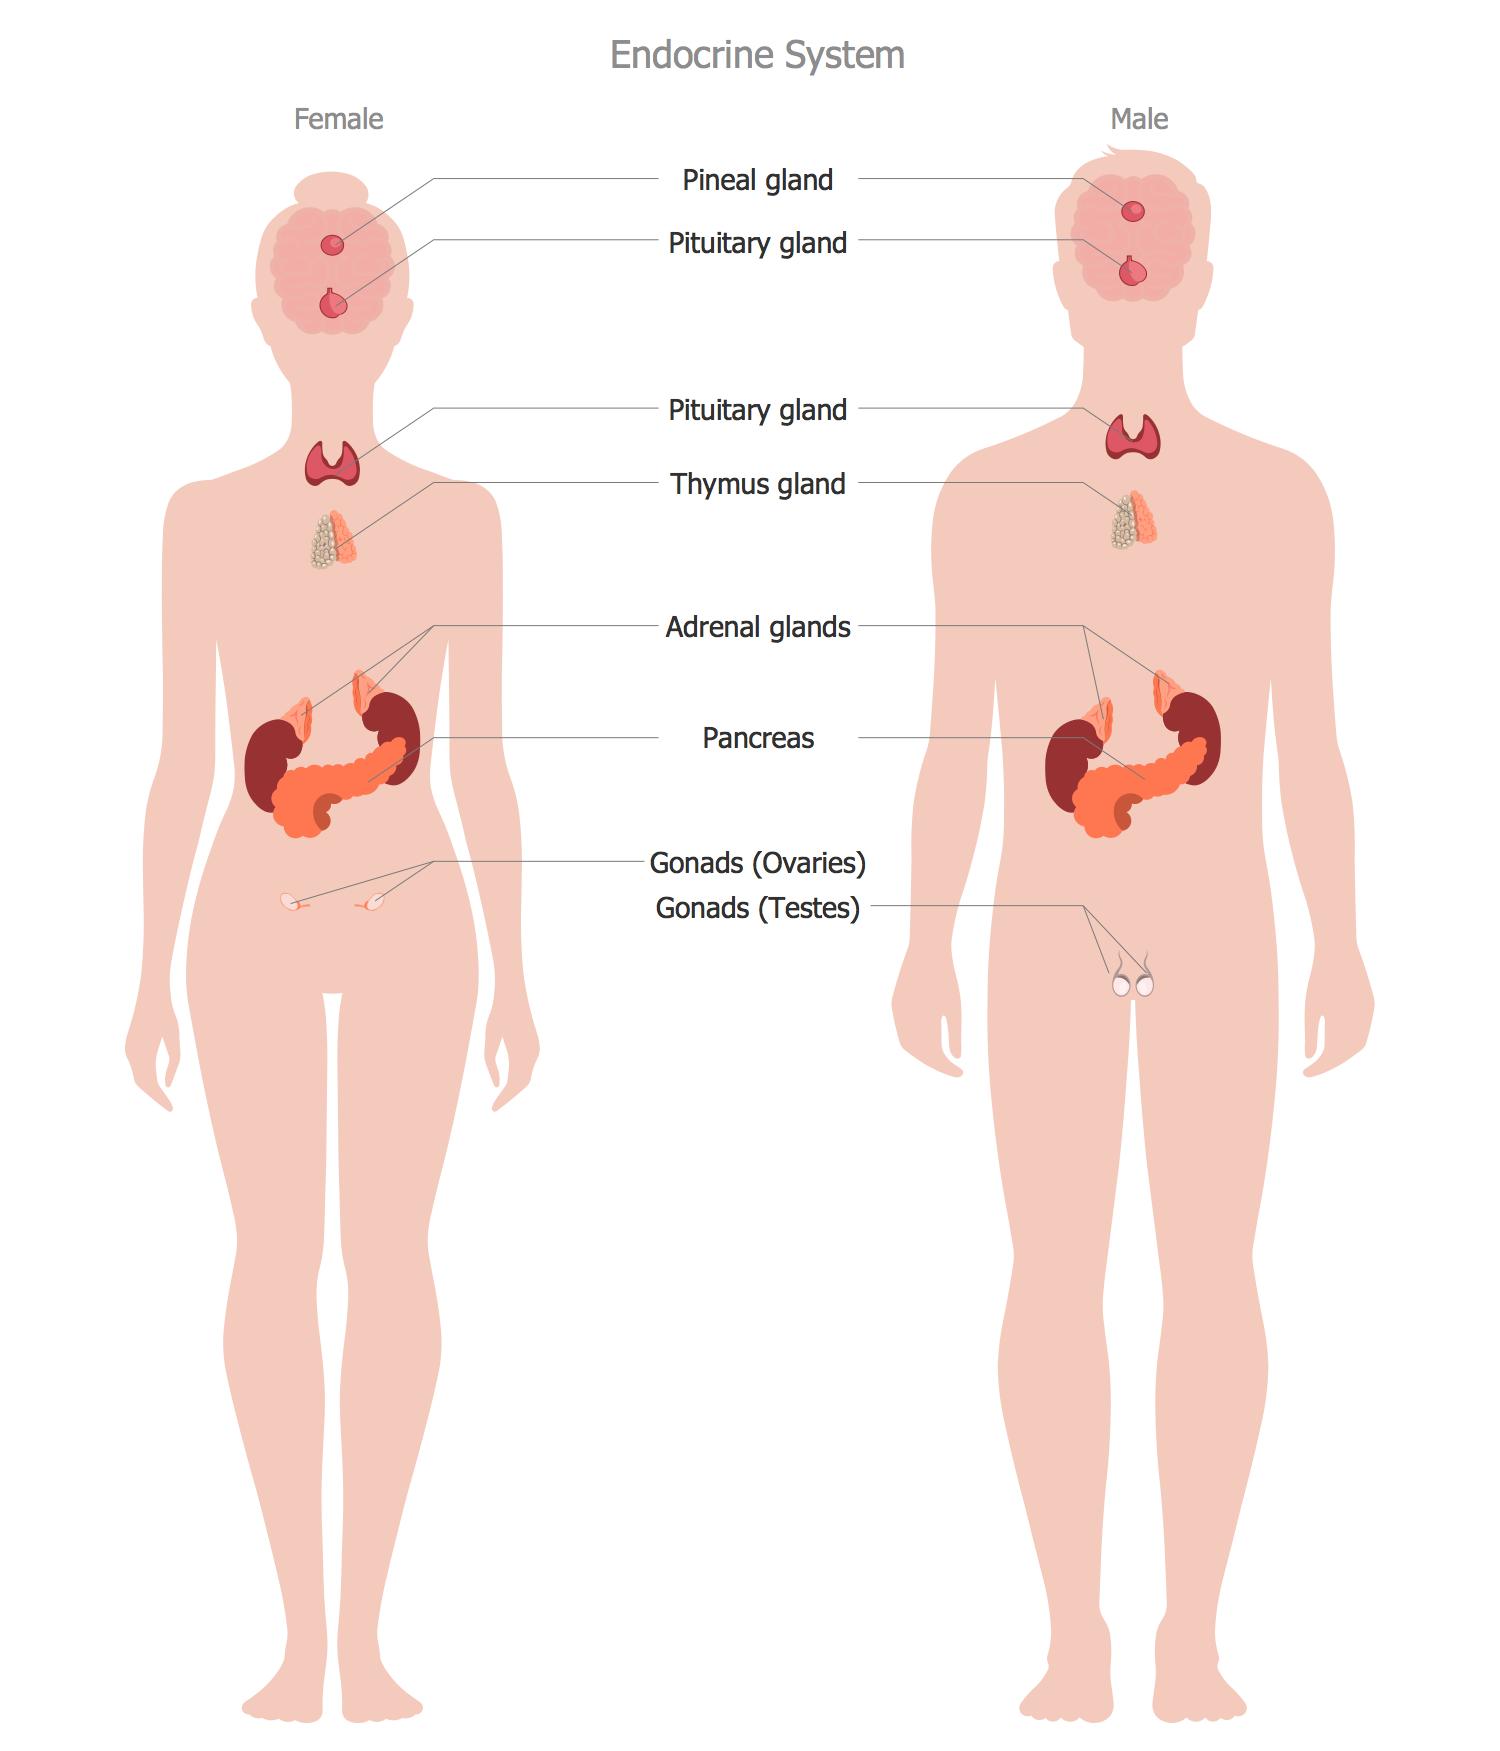 Human Anatomy Endocrine System Images - human body anatomy